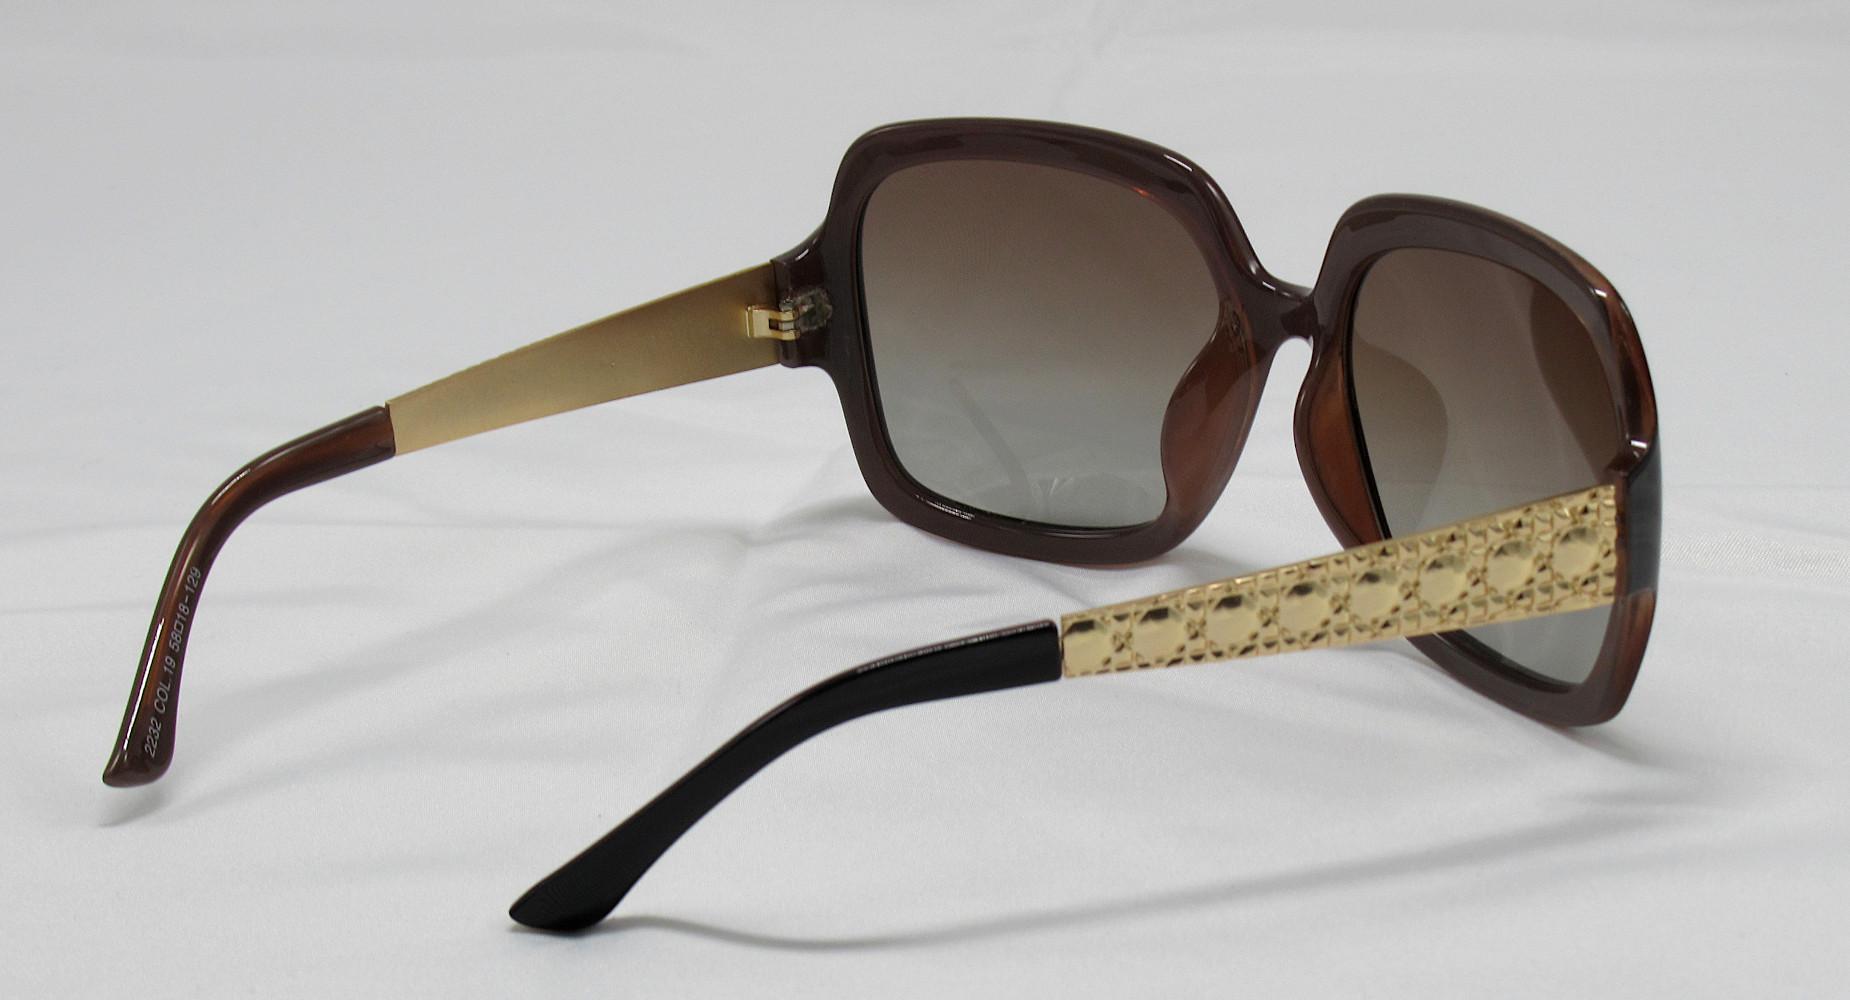 RJ-114_Polarized Sunglasses_brown-gold-P2232-6